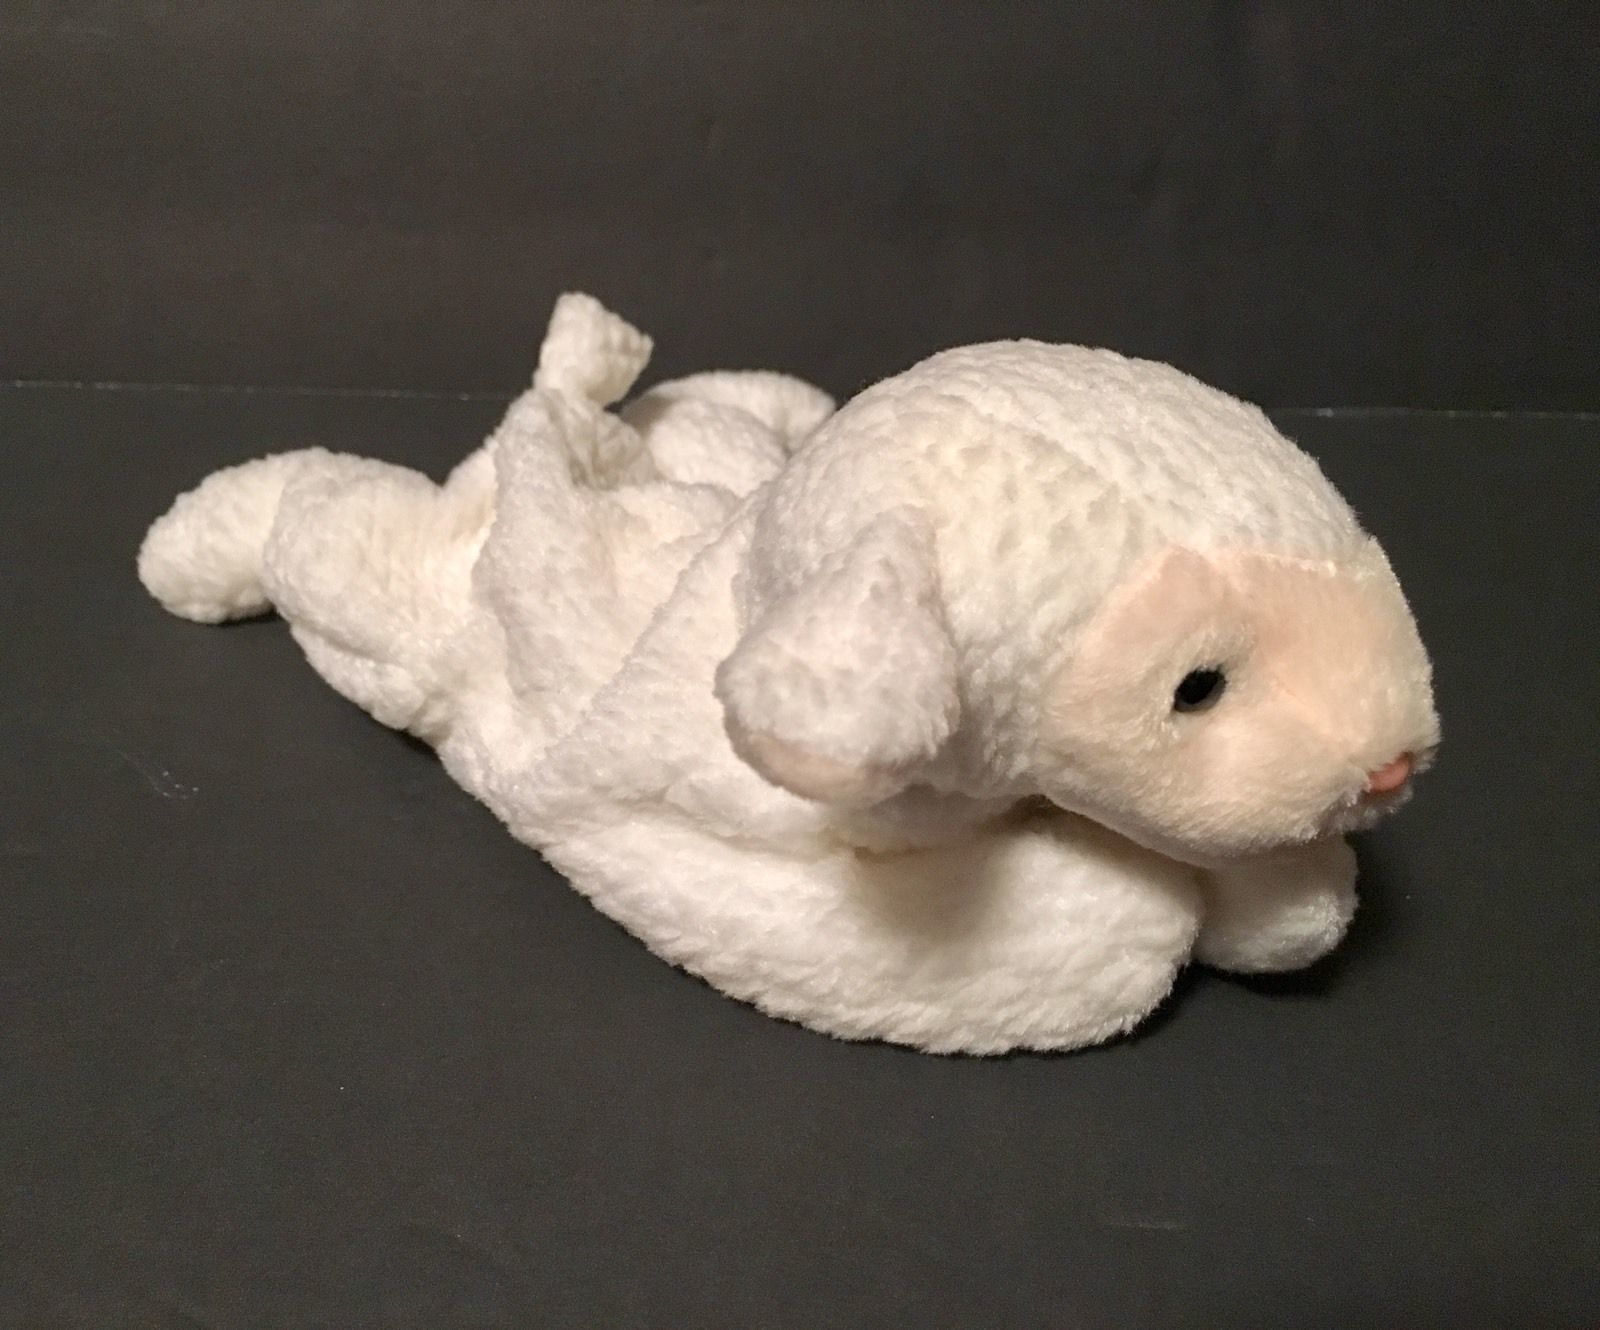 Ty Beanie Babies Plush Beanbag Fleece the Lamb Sheep White Pink Nose